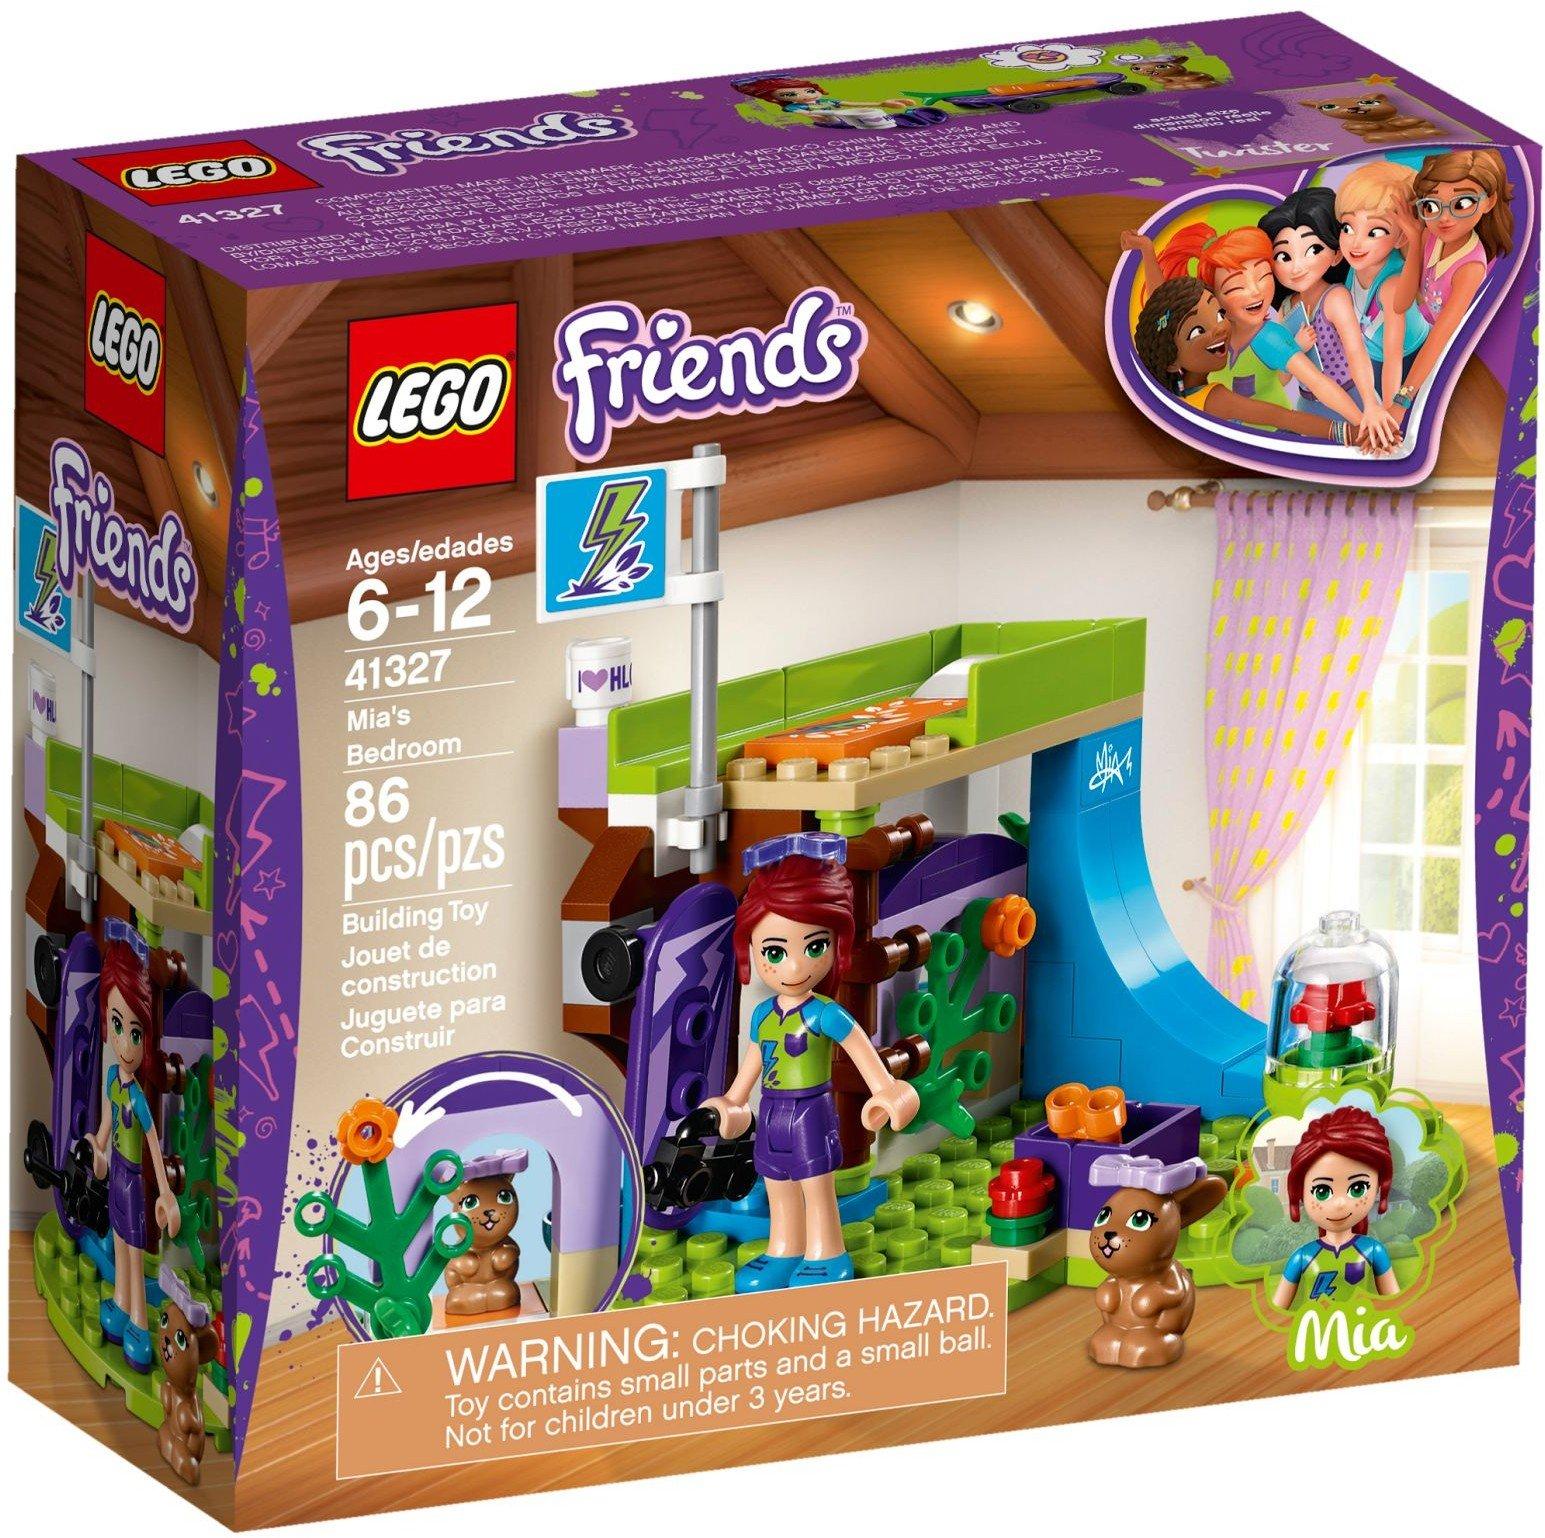 Lego 41328 Stephanies Bedroom Lego Sets Friends Mojeklocki24